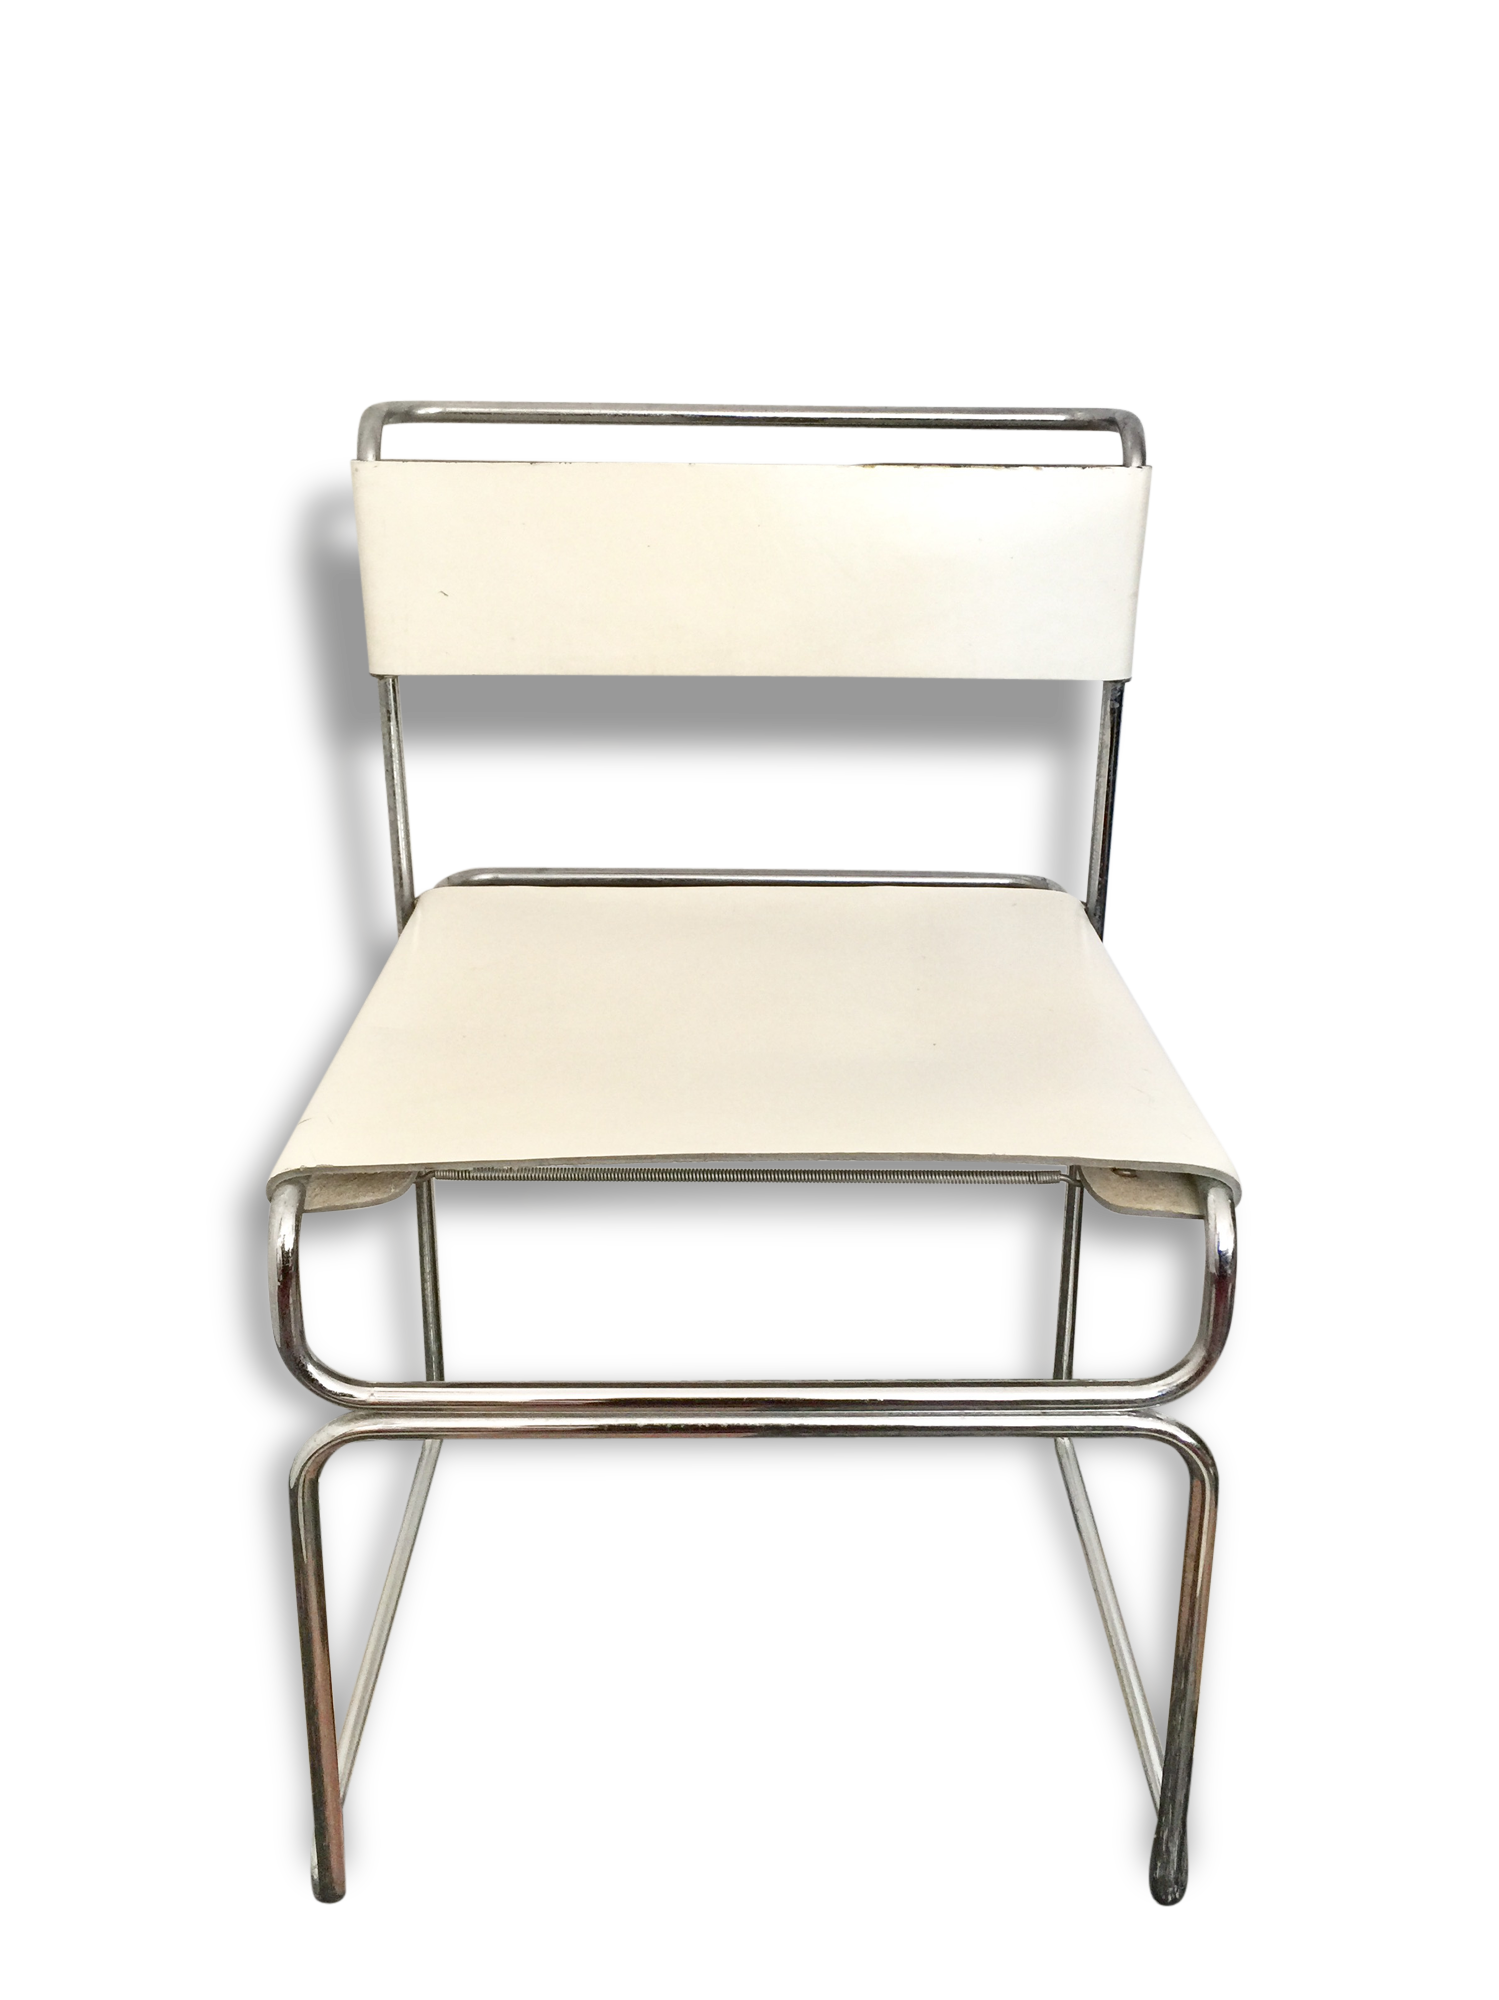 Fauteuil de bureau design chrome et cuir blanc leather